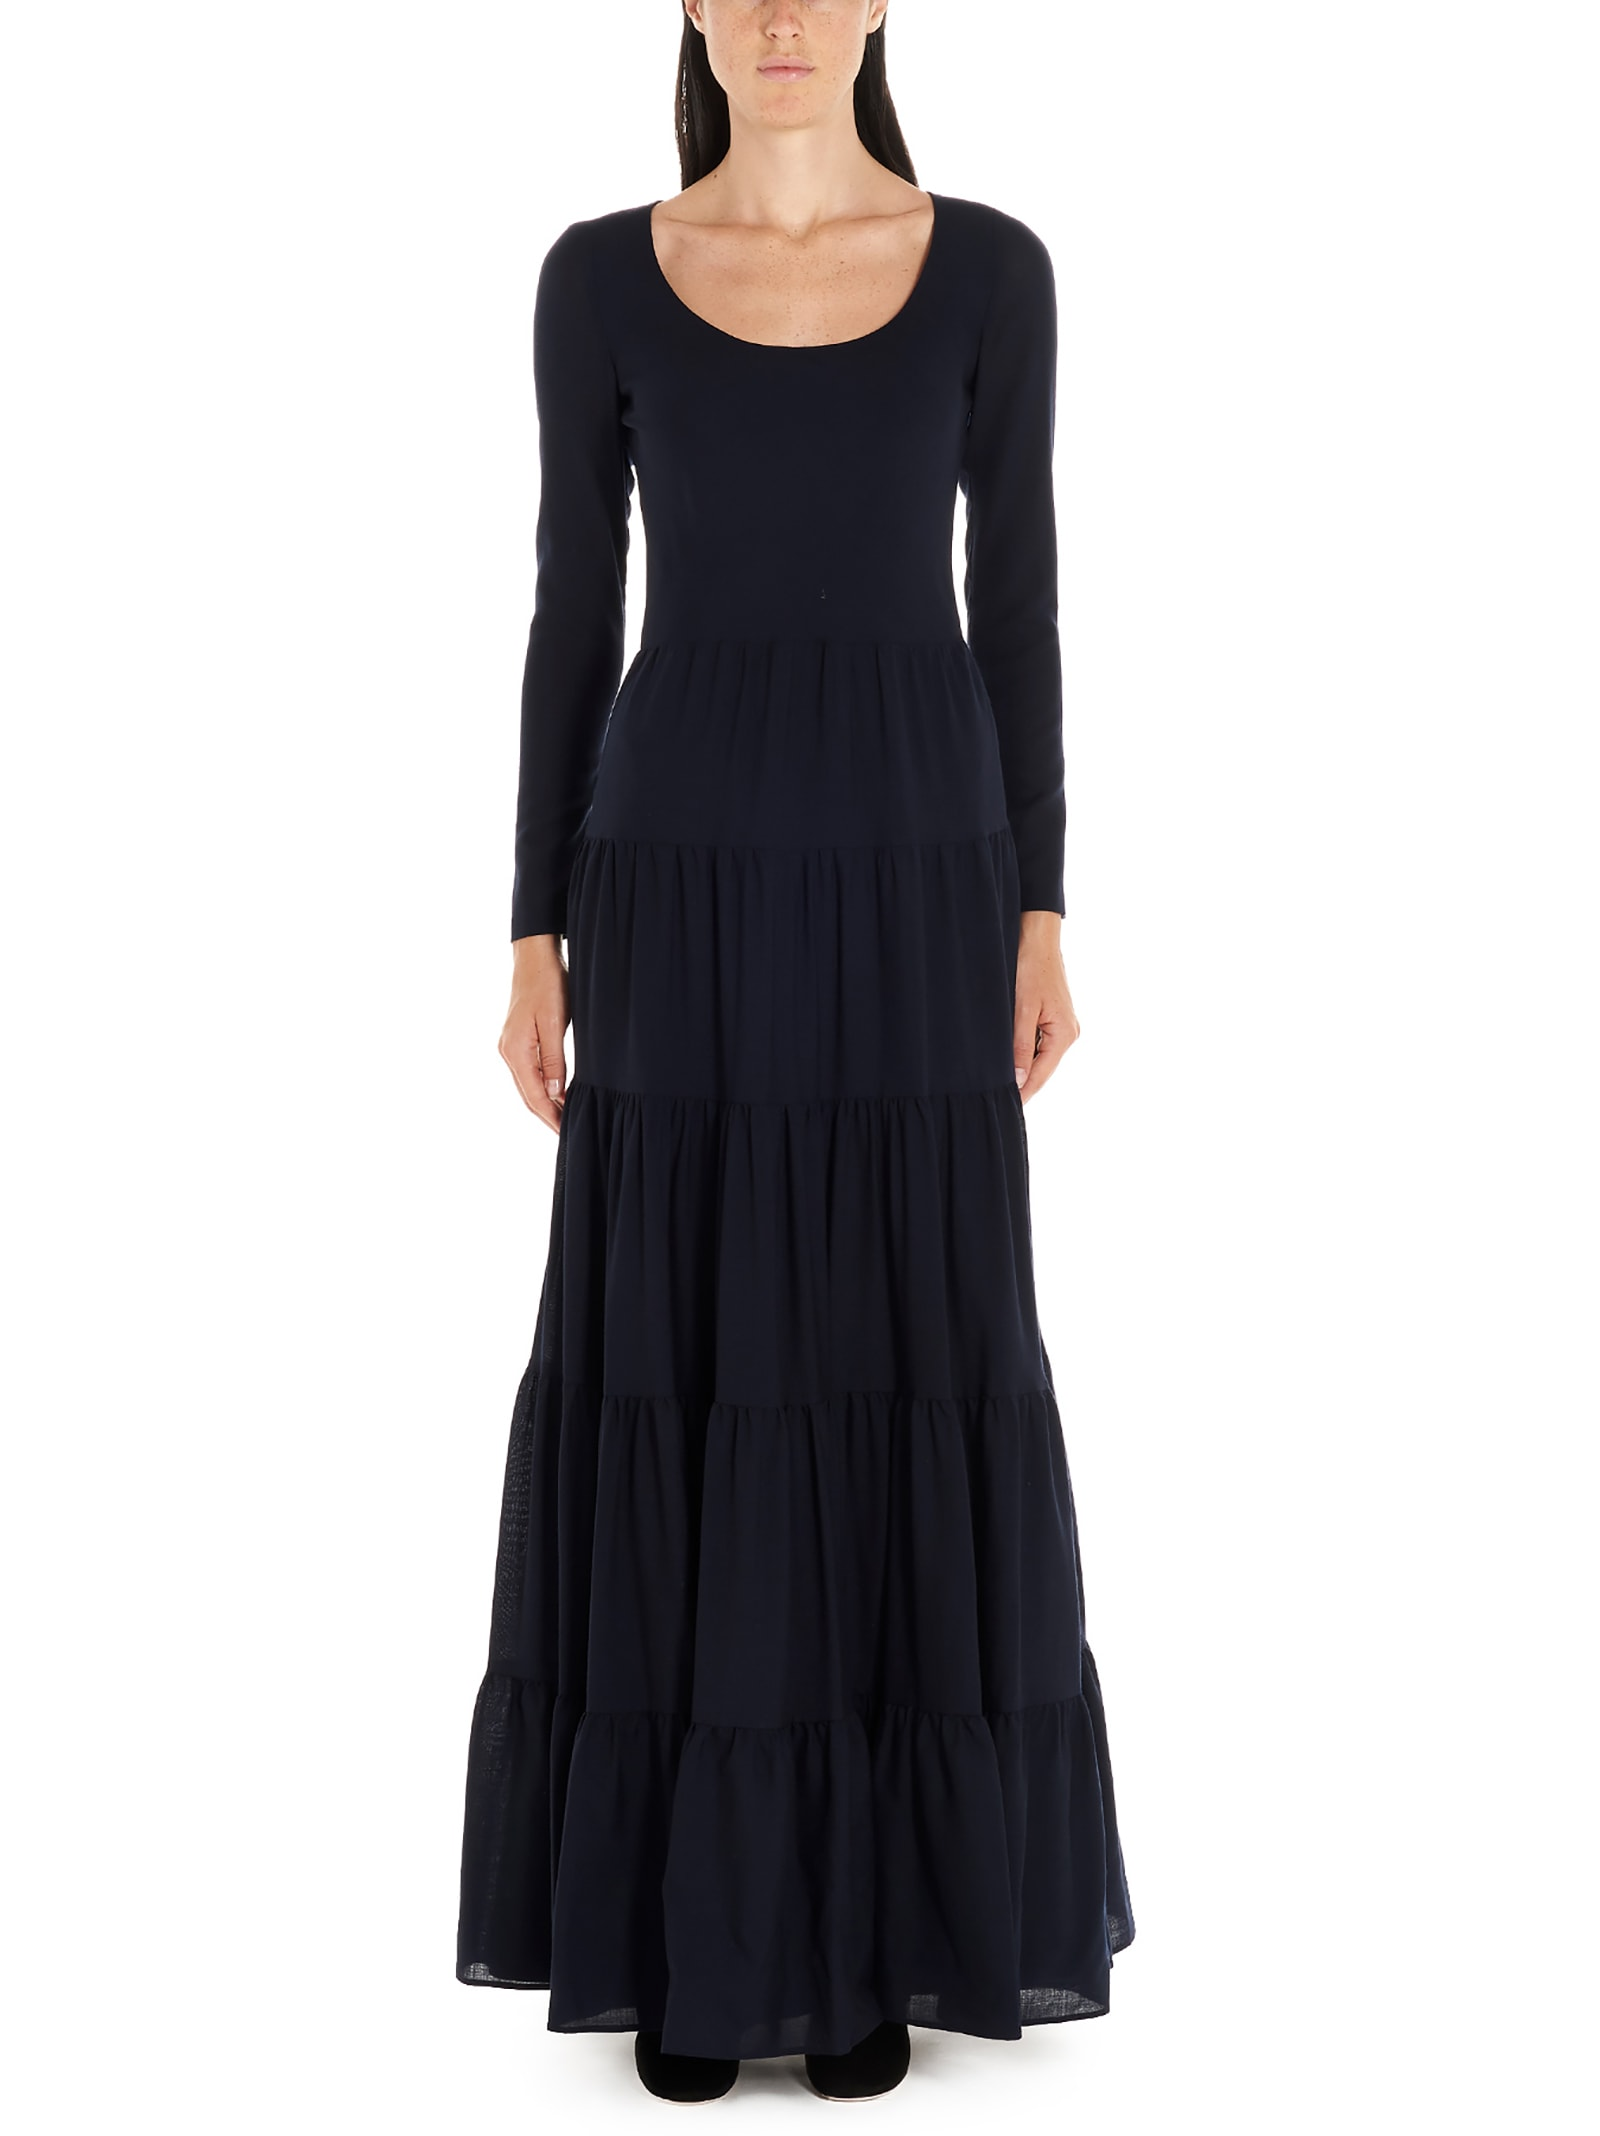 Gabriela Hearst slava Dress Dress